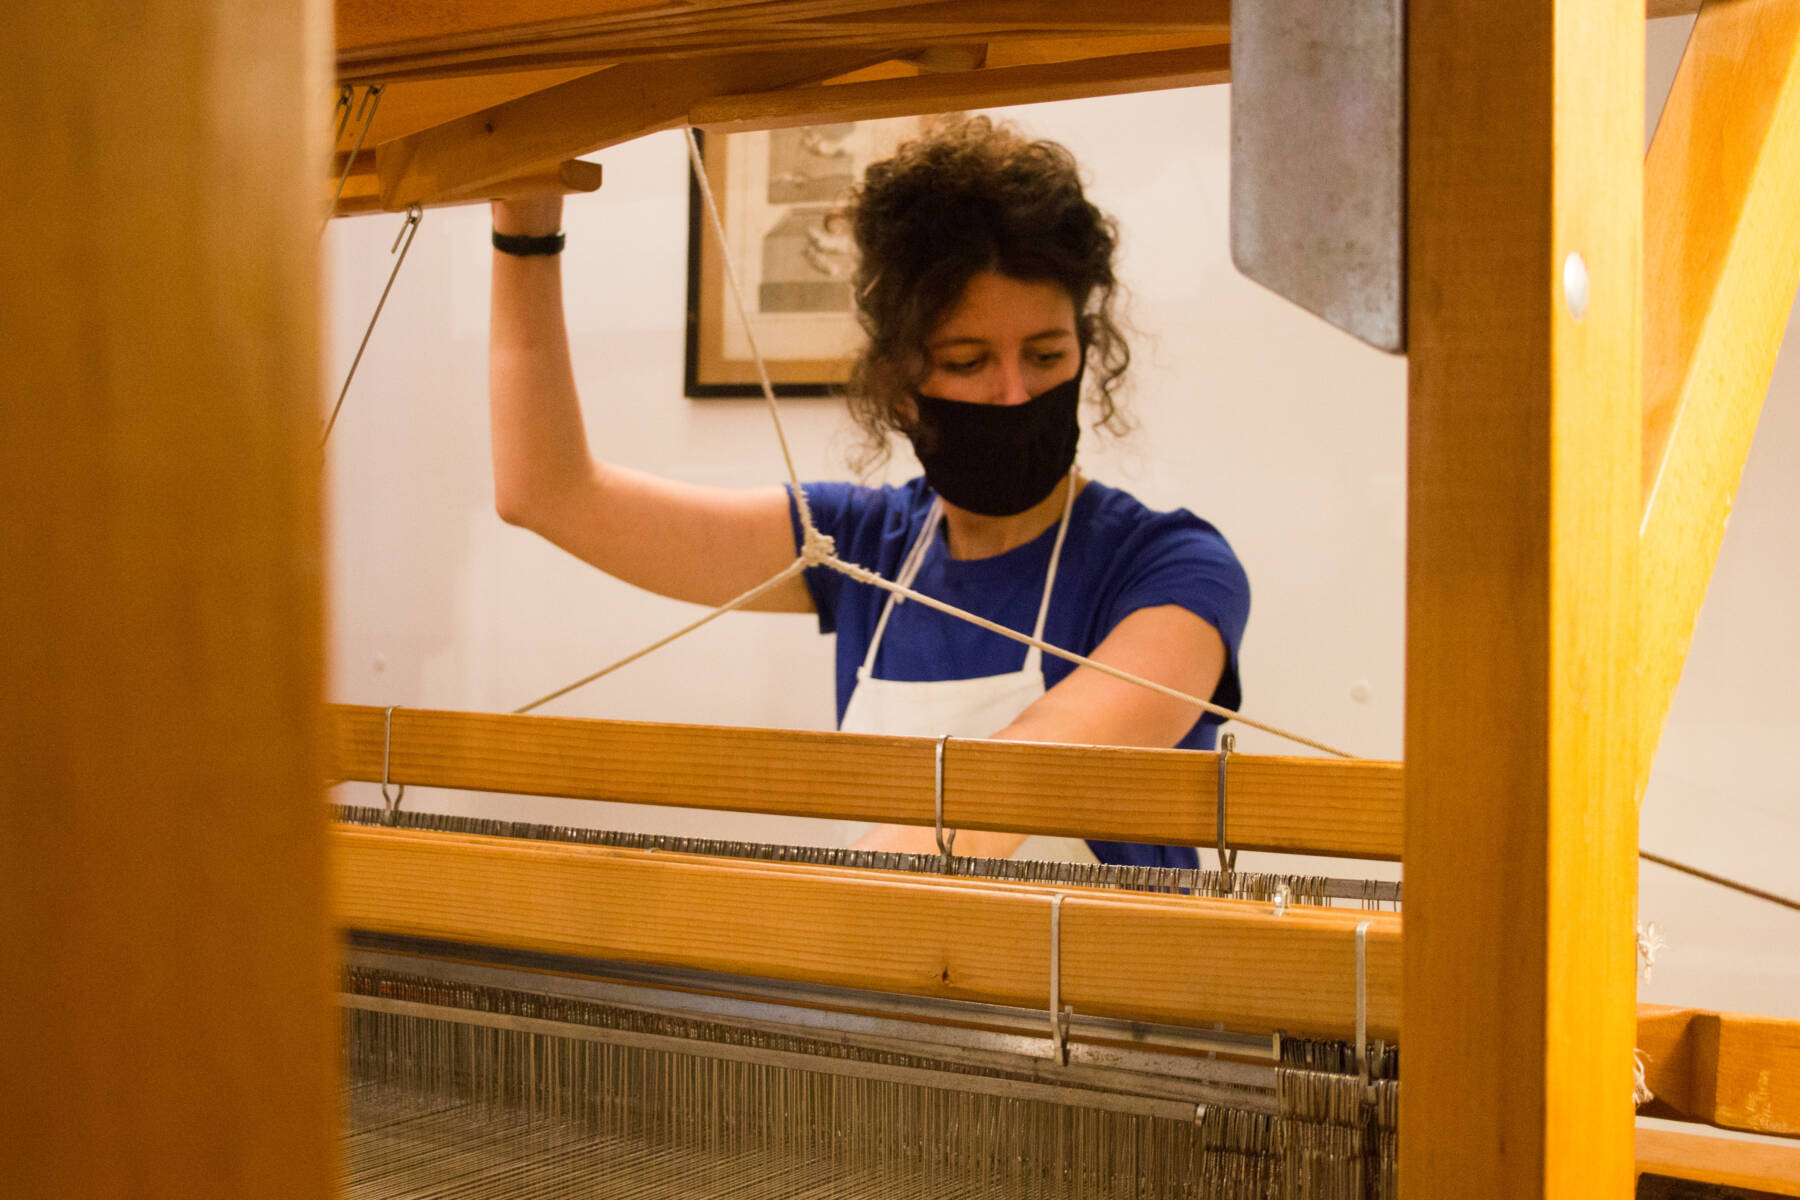 Tannyna Kowalski dans l'atelier de Sylvie Johnson